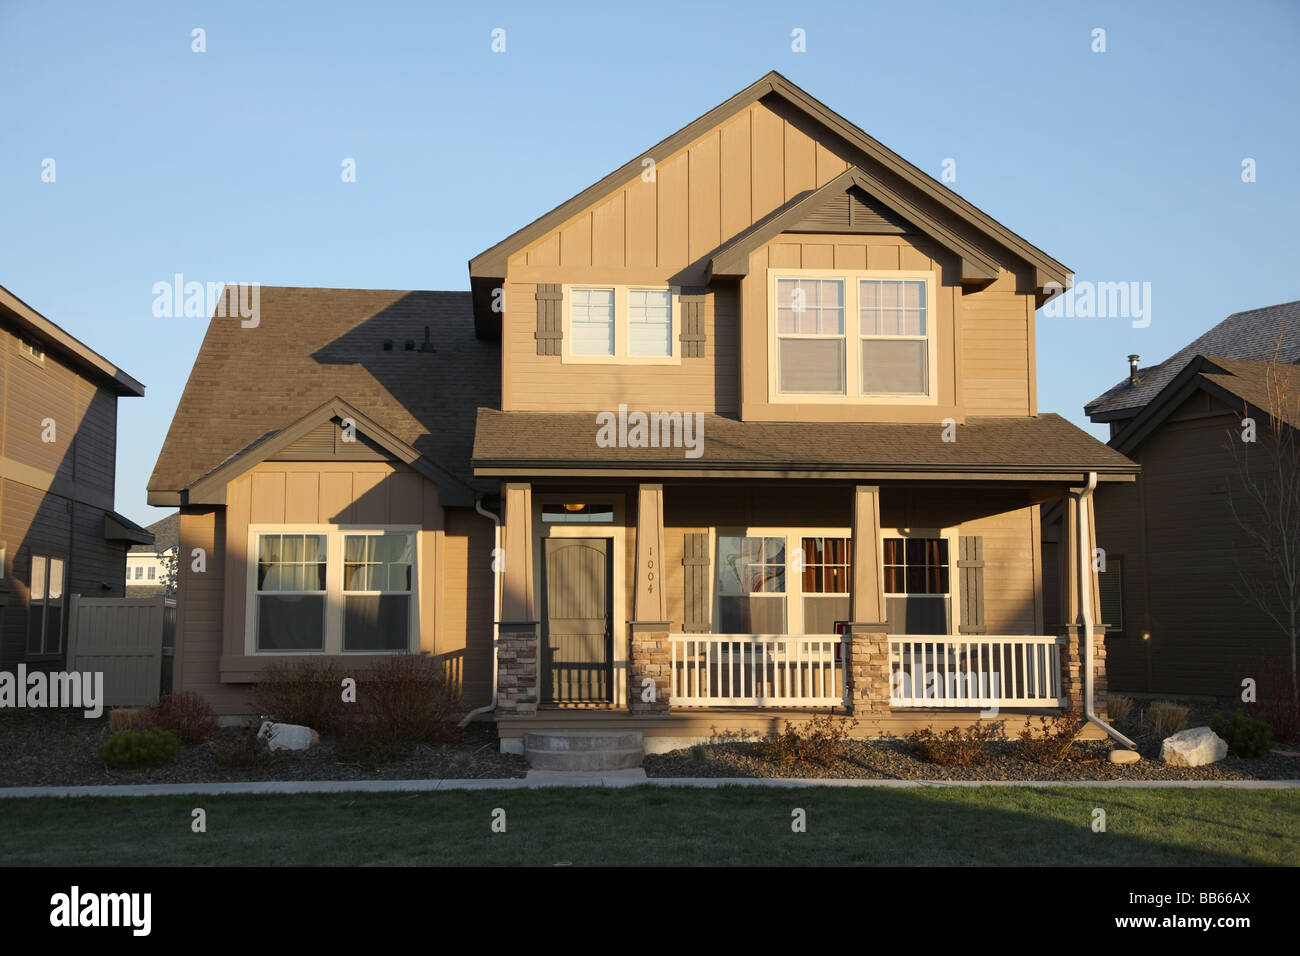 Exterior del hogar suburbano Imagen De Stock